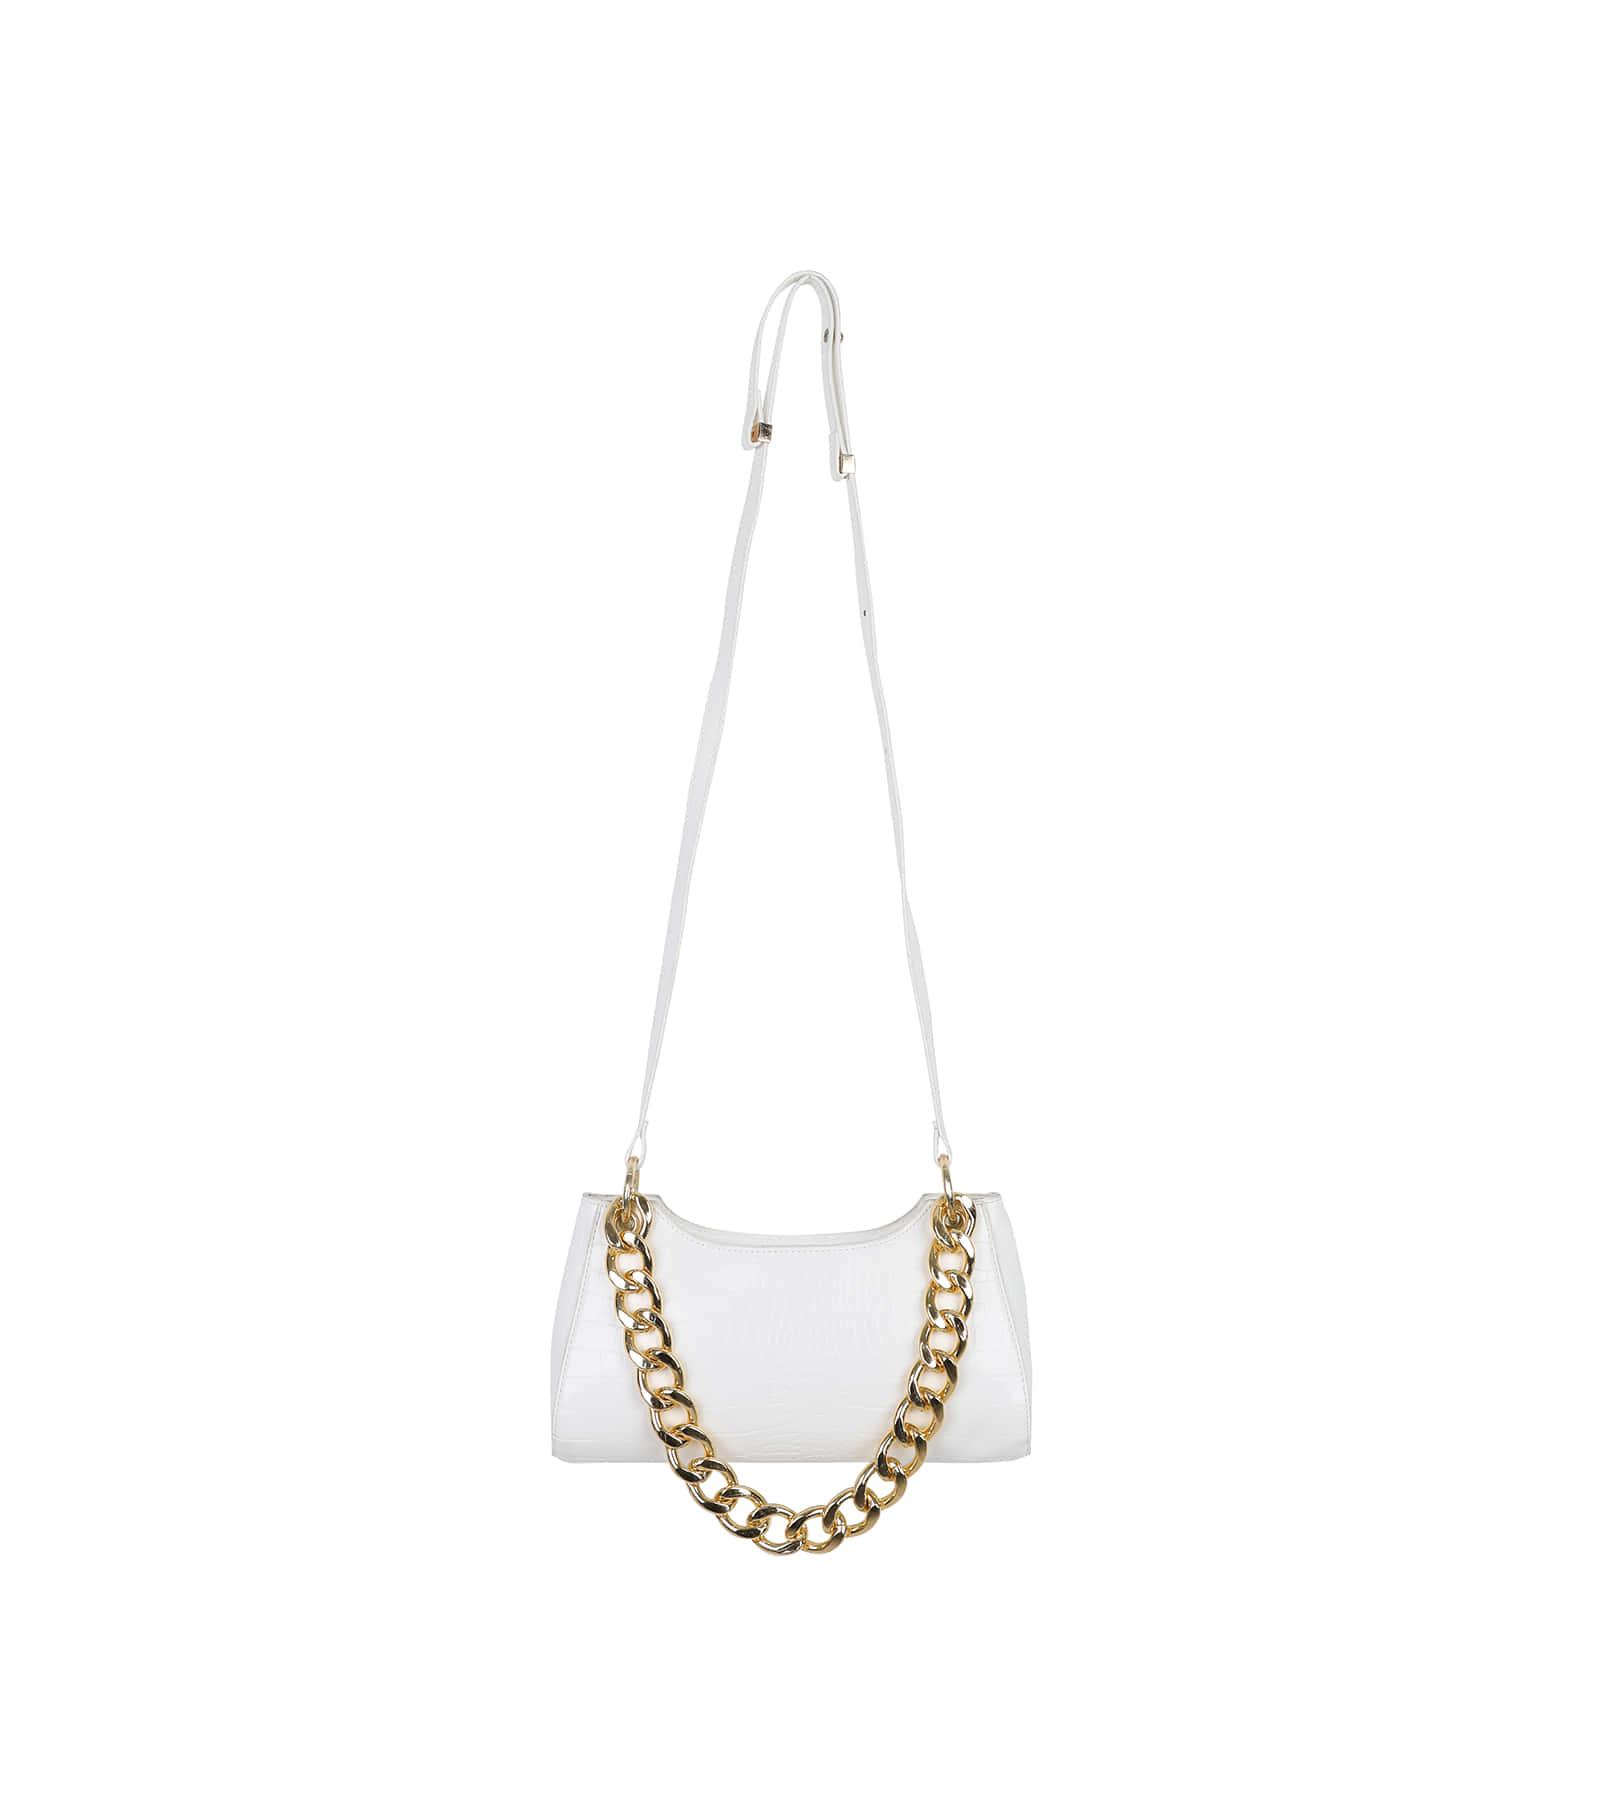 Zard animal pattern chain shoulder bag